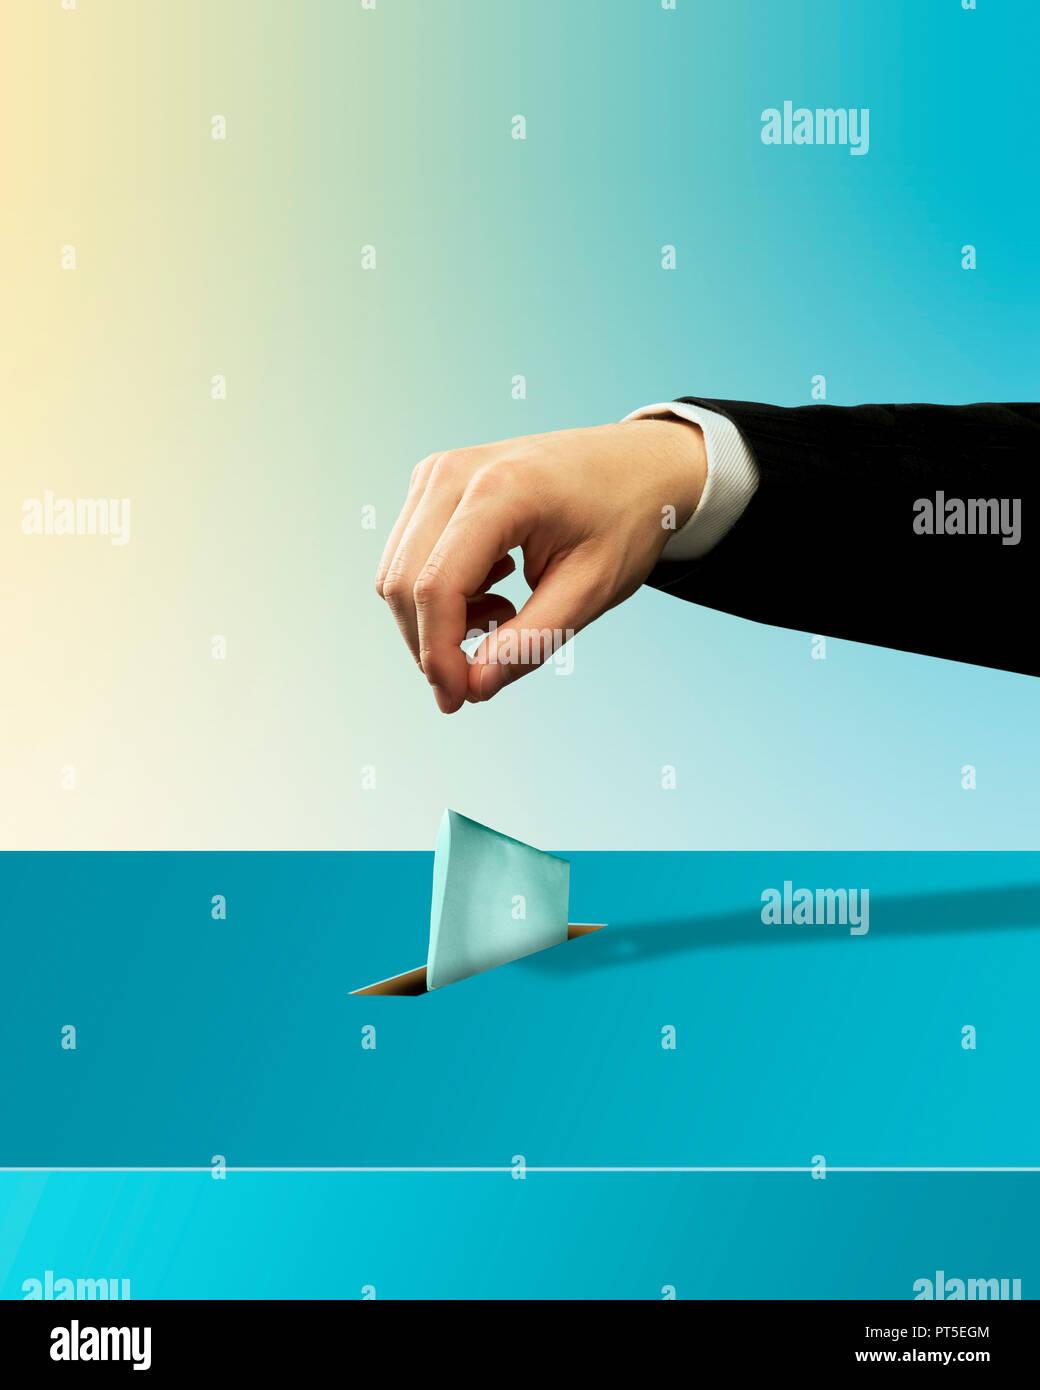 Concept A Man Hand dropping off a ballot, Ballot Box, Voting, Vote, Election - Stock Image